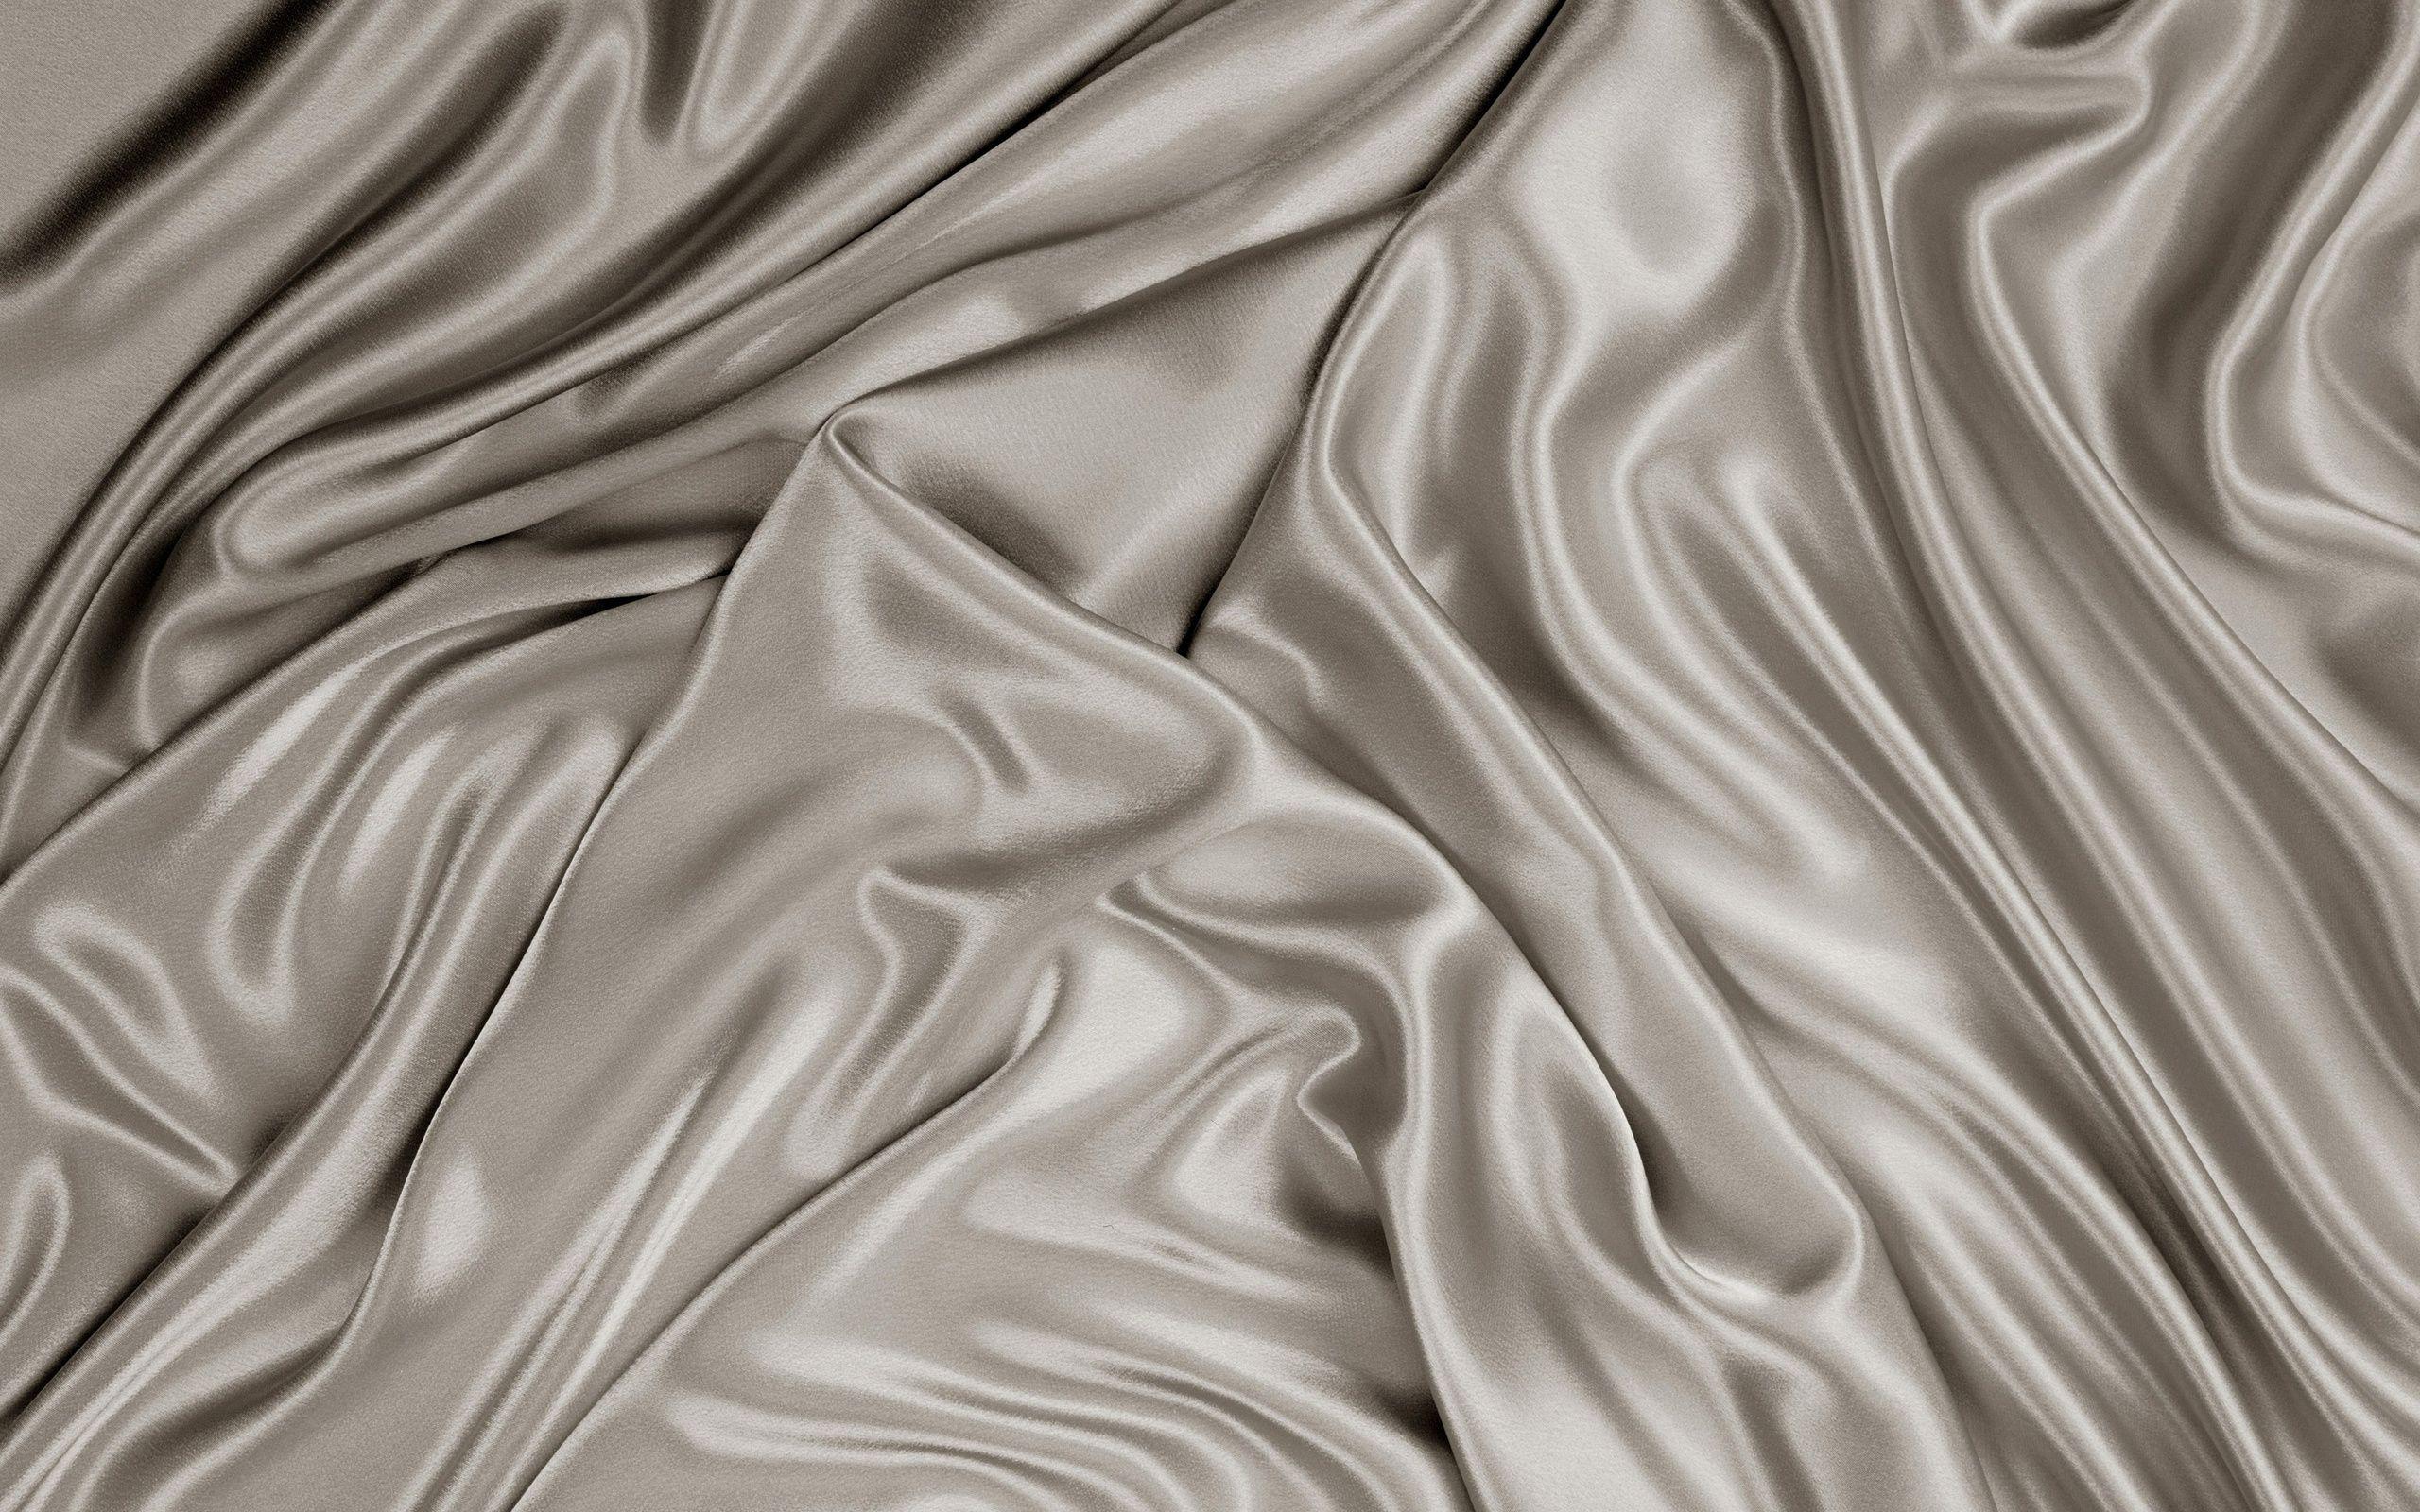 Wallpaper Satin Gray Silk Cloth Texture Hd Picture Image Fabric Textures Textured Wallpaper Wallpaper Backgrounds